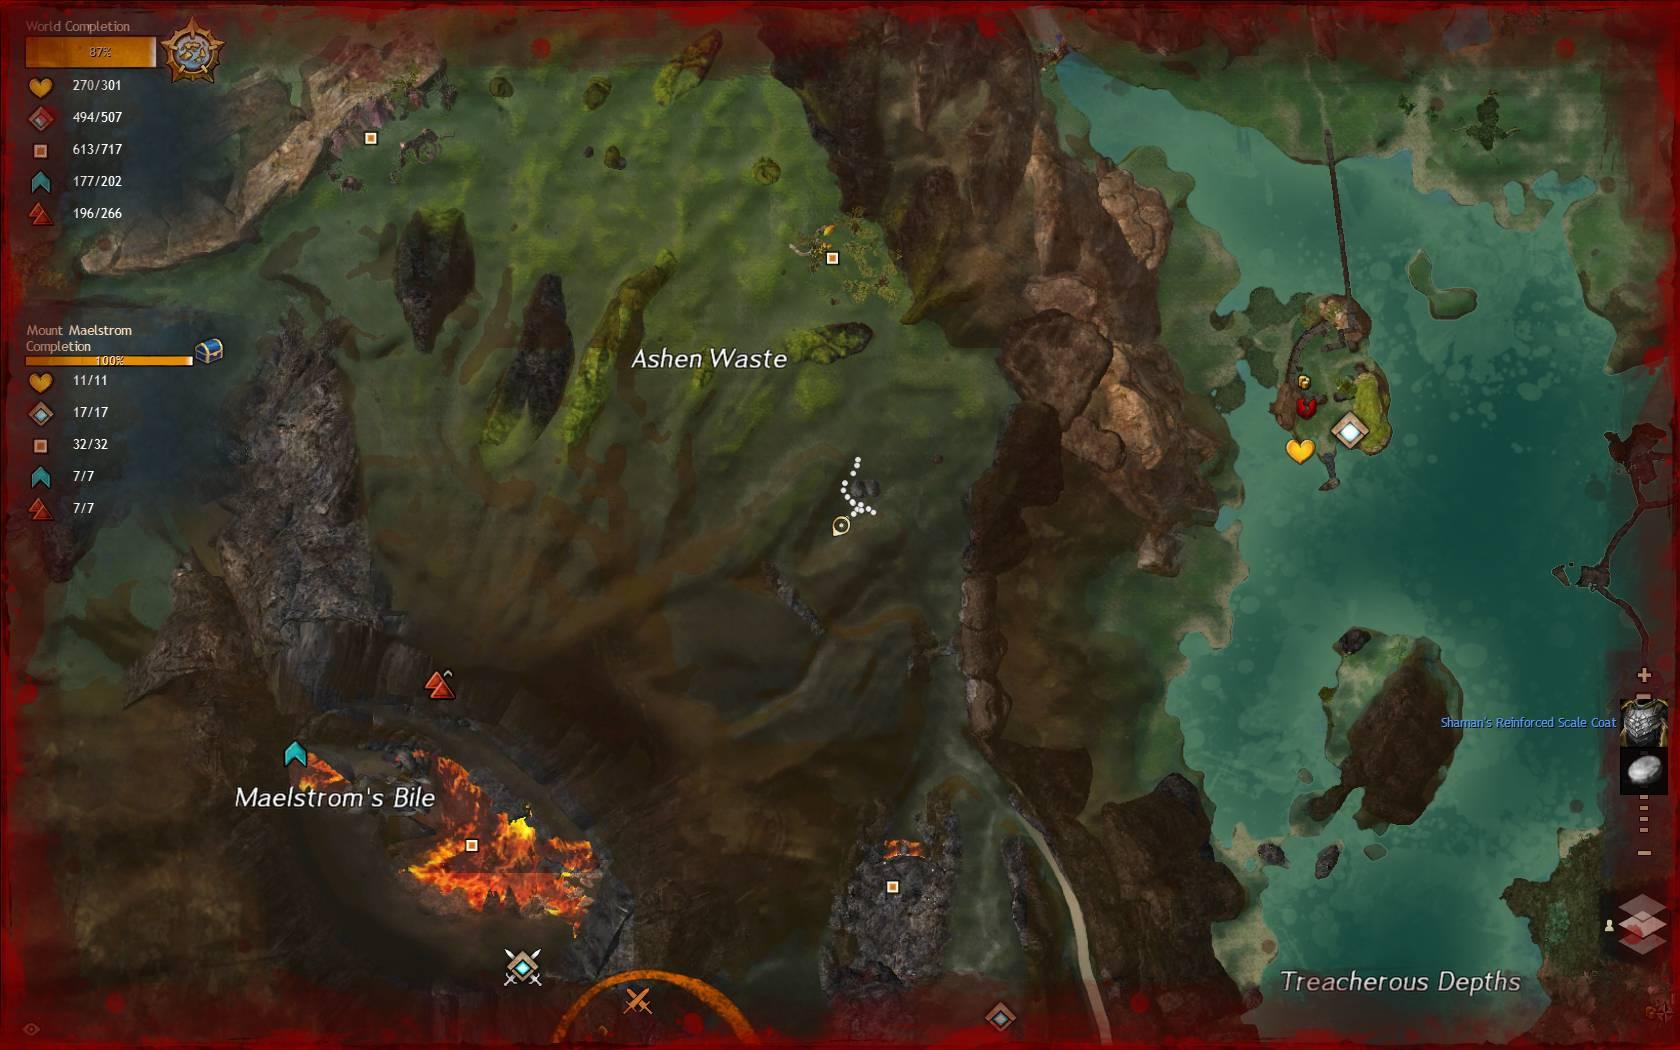 Hidden_Garden_Jumping_Puzzle_keeper_Of_light (5) - Guild Wars 2 Life